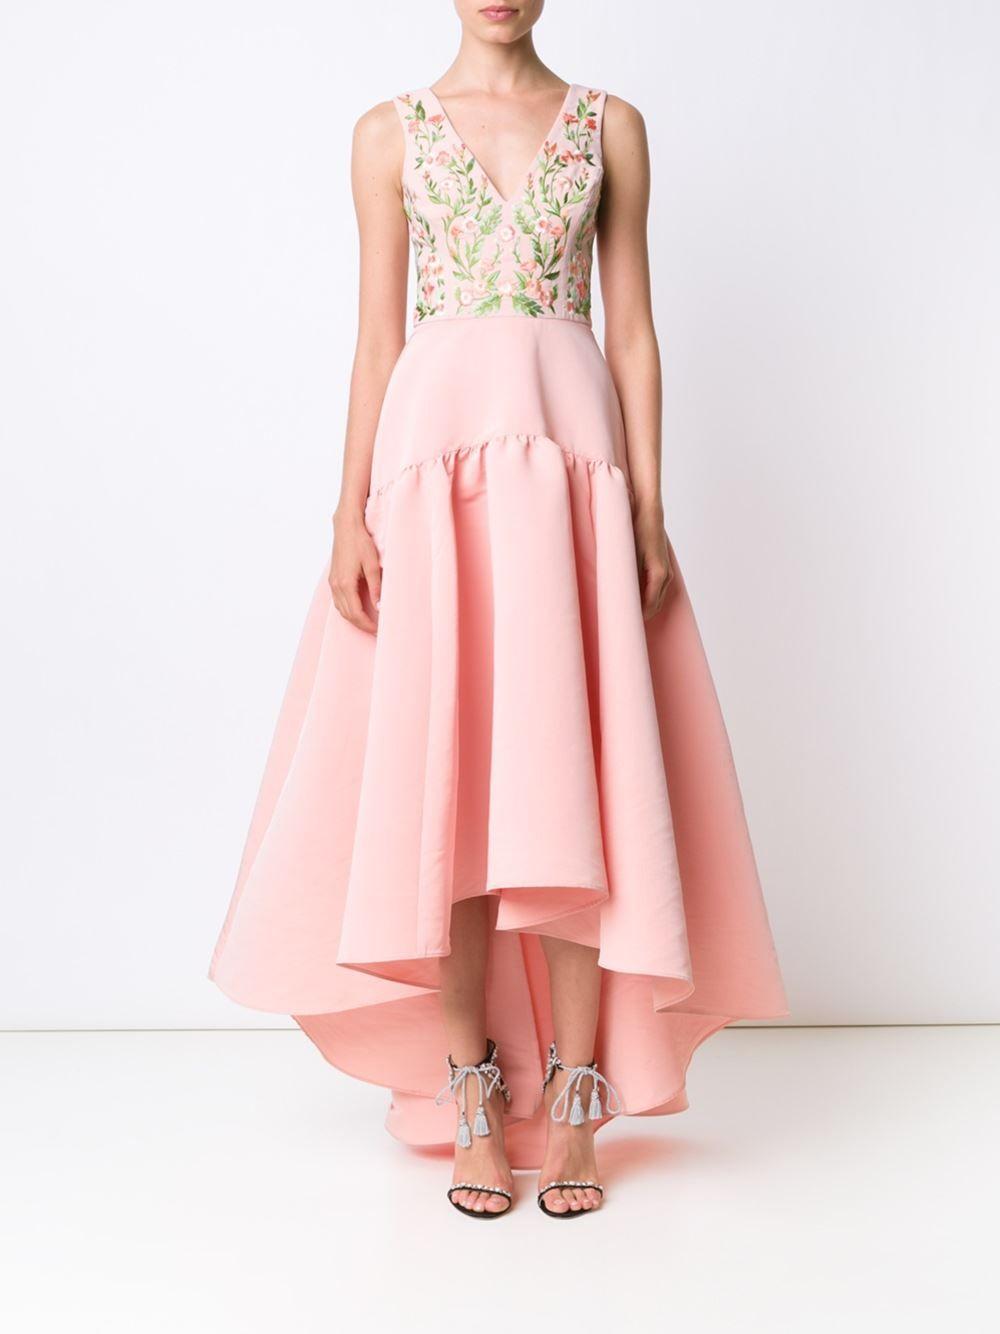 Marchesa Notte embroidered flower gown   - FARFETCH -   Pinterest ...